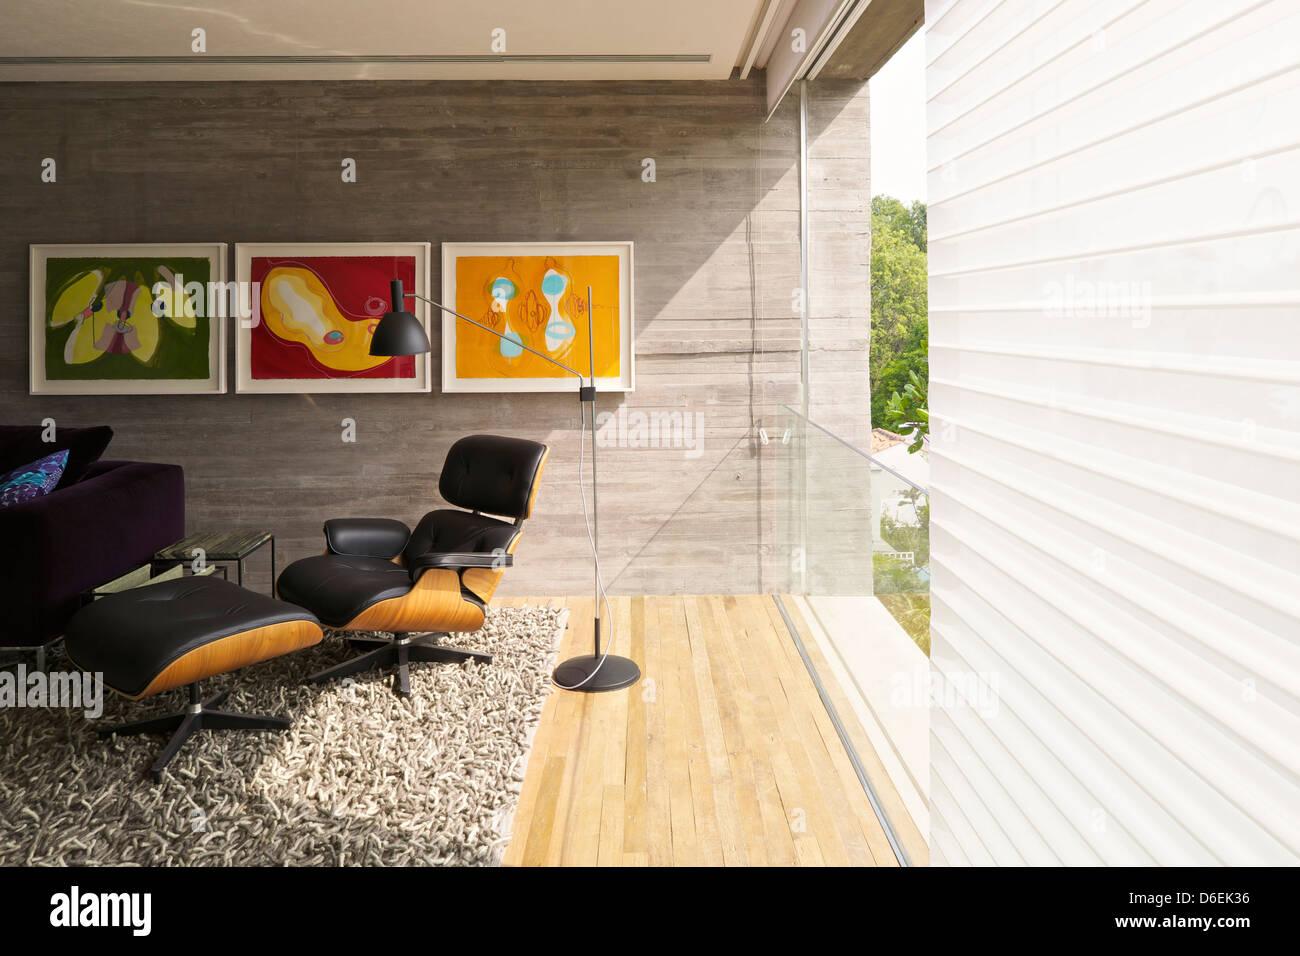 Casa Cubo, Sao Paulo, Brazil. Architect: Studio MK27- Marcio Kogan, 2012. First floor view with Eames Lounge Chair. Stock Photo